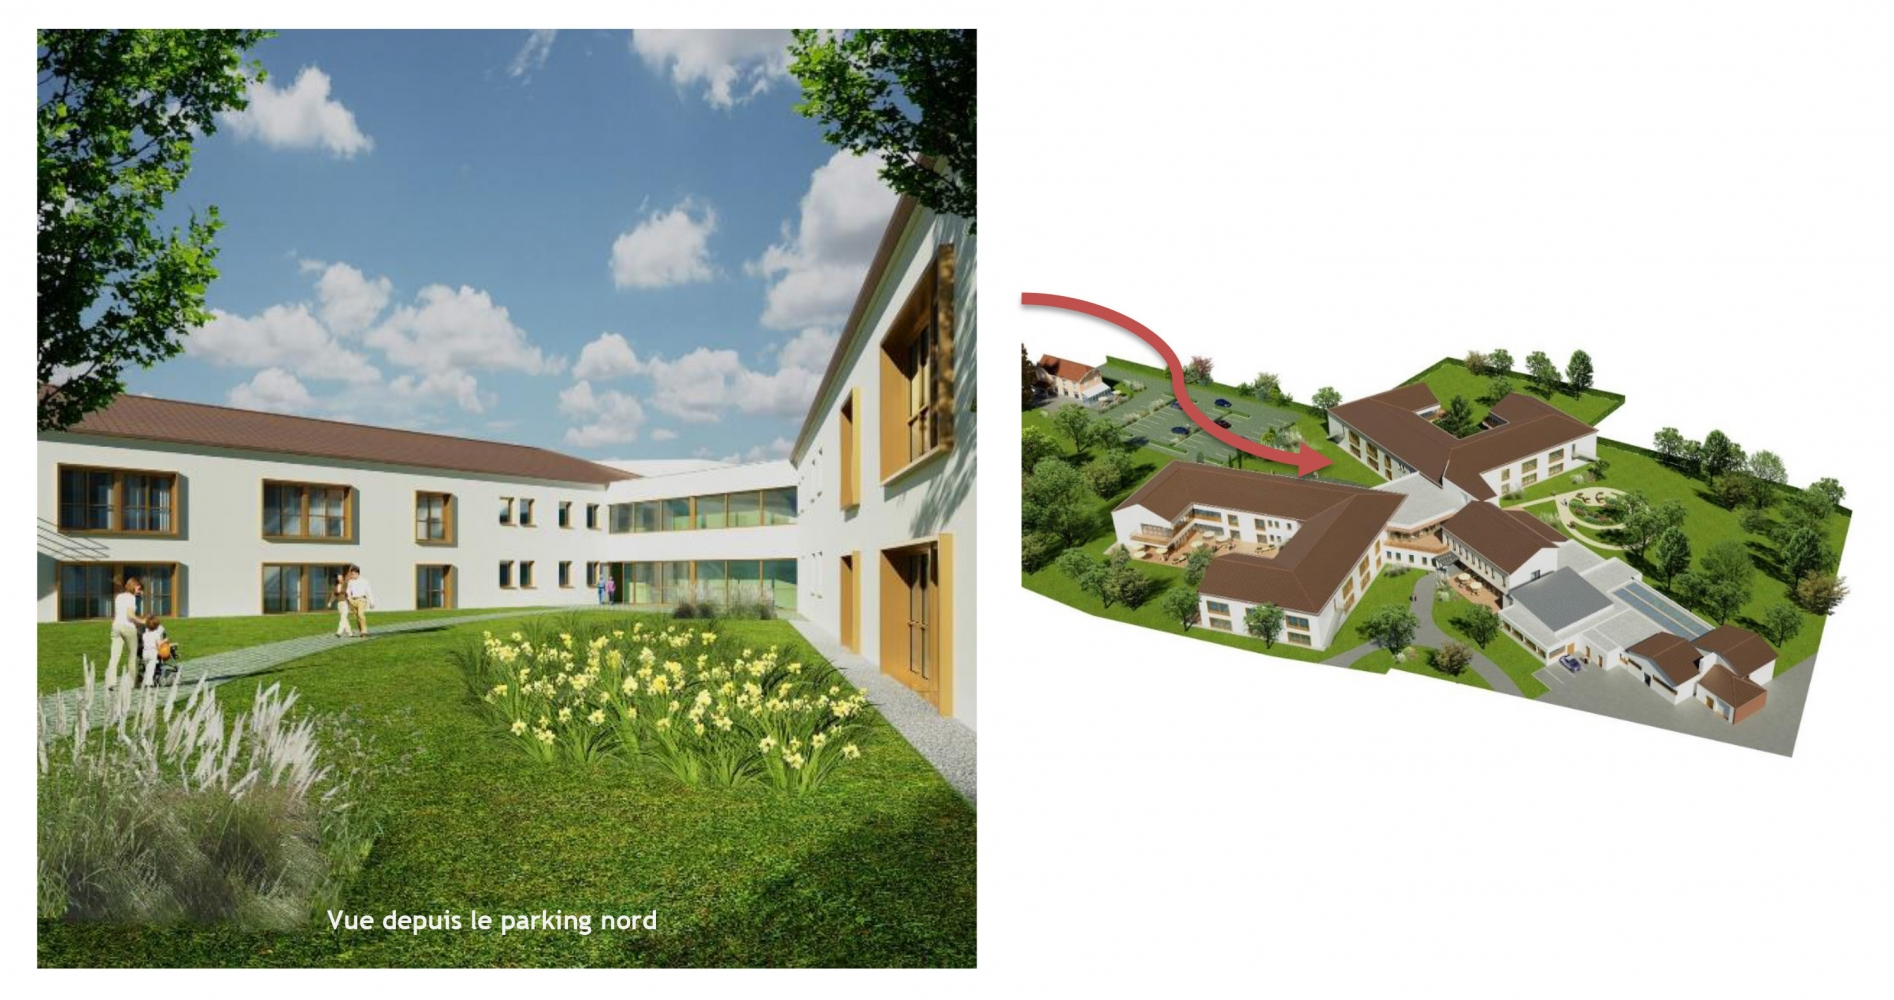 01-st-germain-img-005 Pascale SEURIN Architecte - Médico-Social